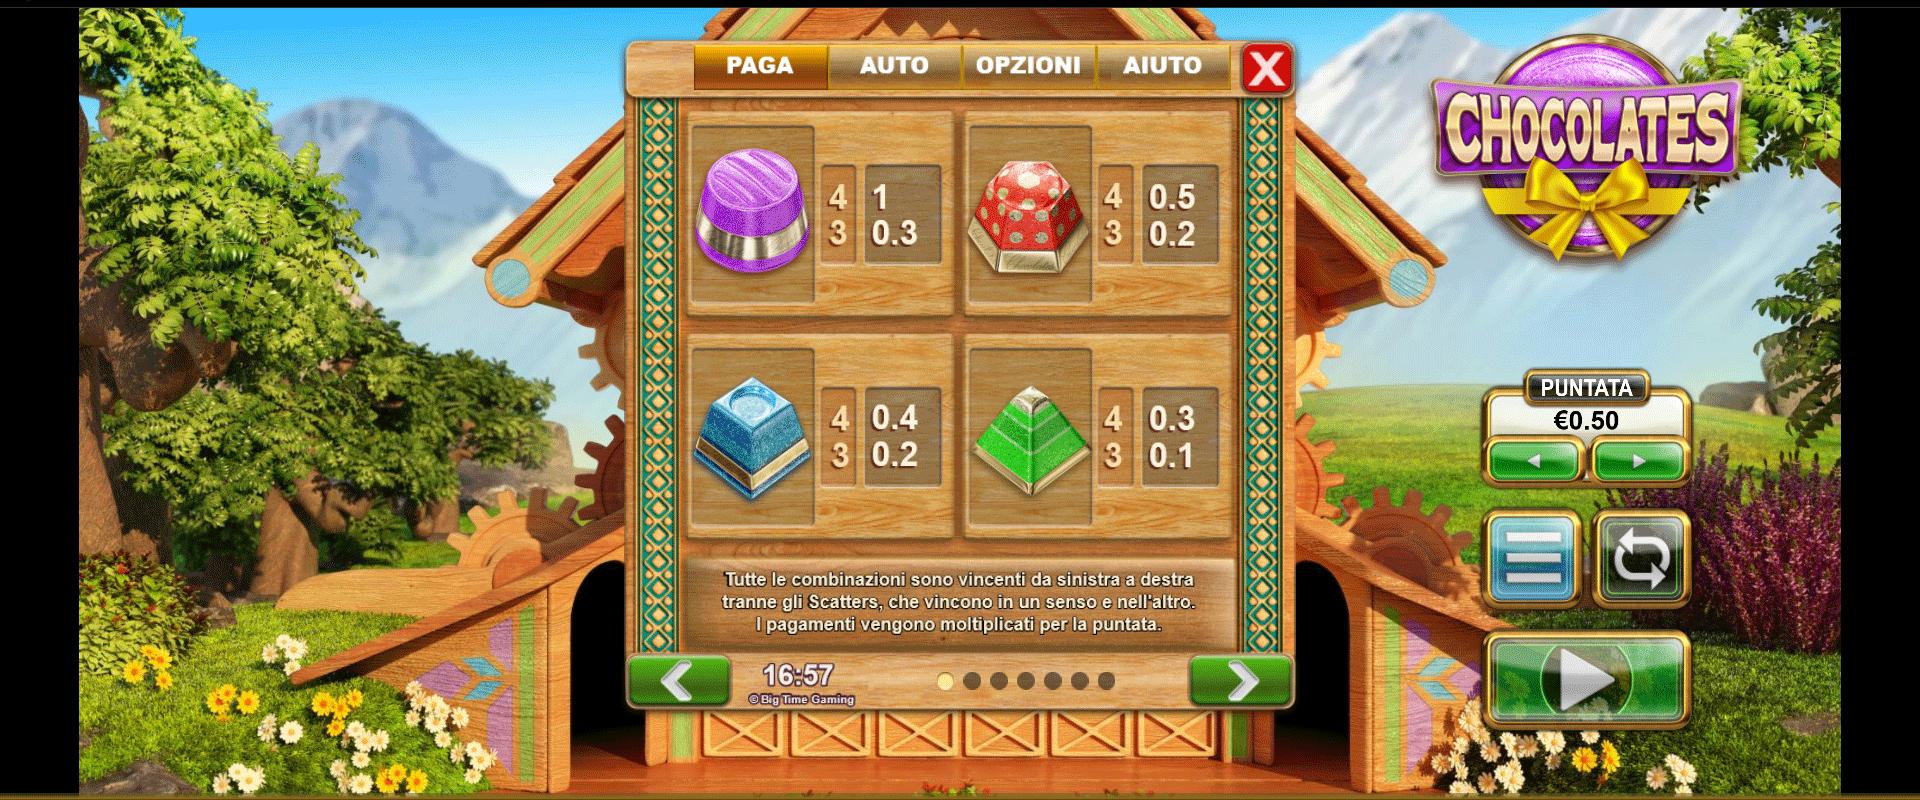 paytable della slot online chocolates